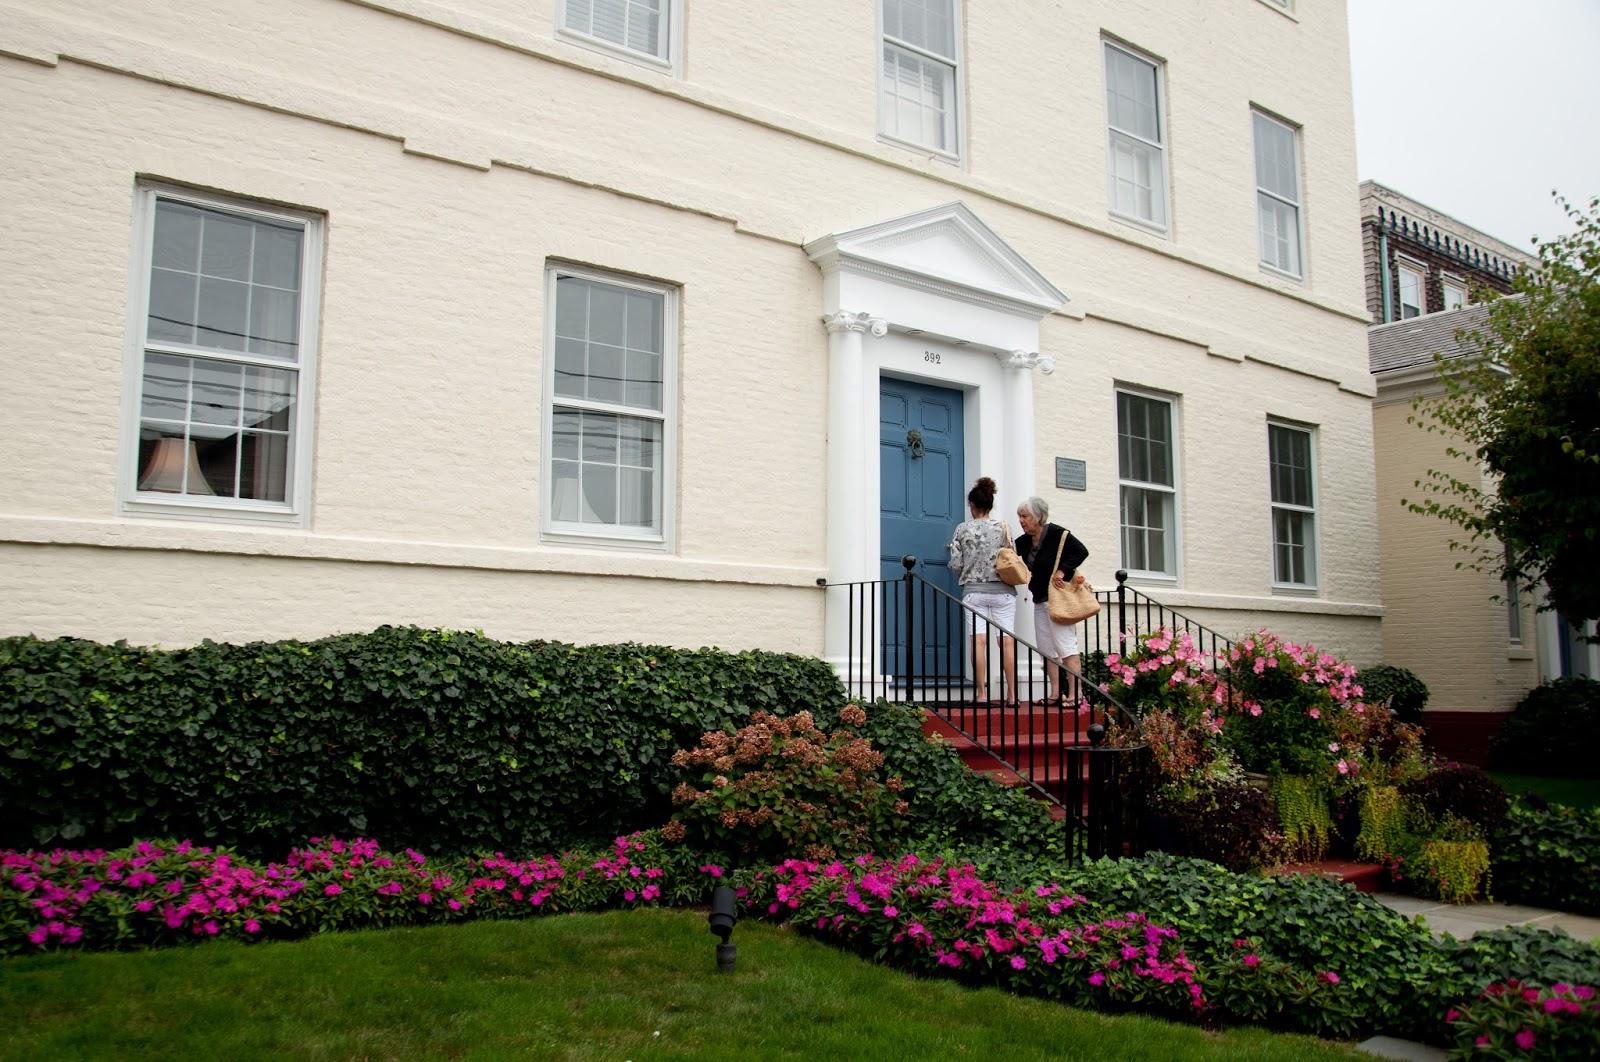 Viata in america din perspectiva unui roman pe coasta de for Casa coloniale americana